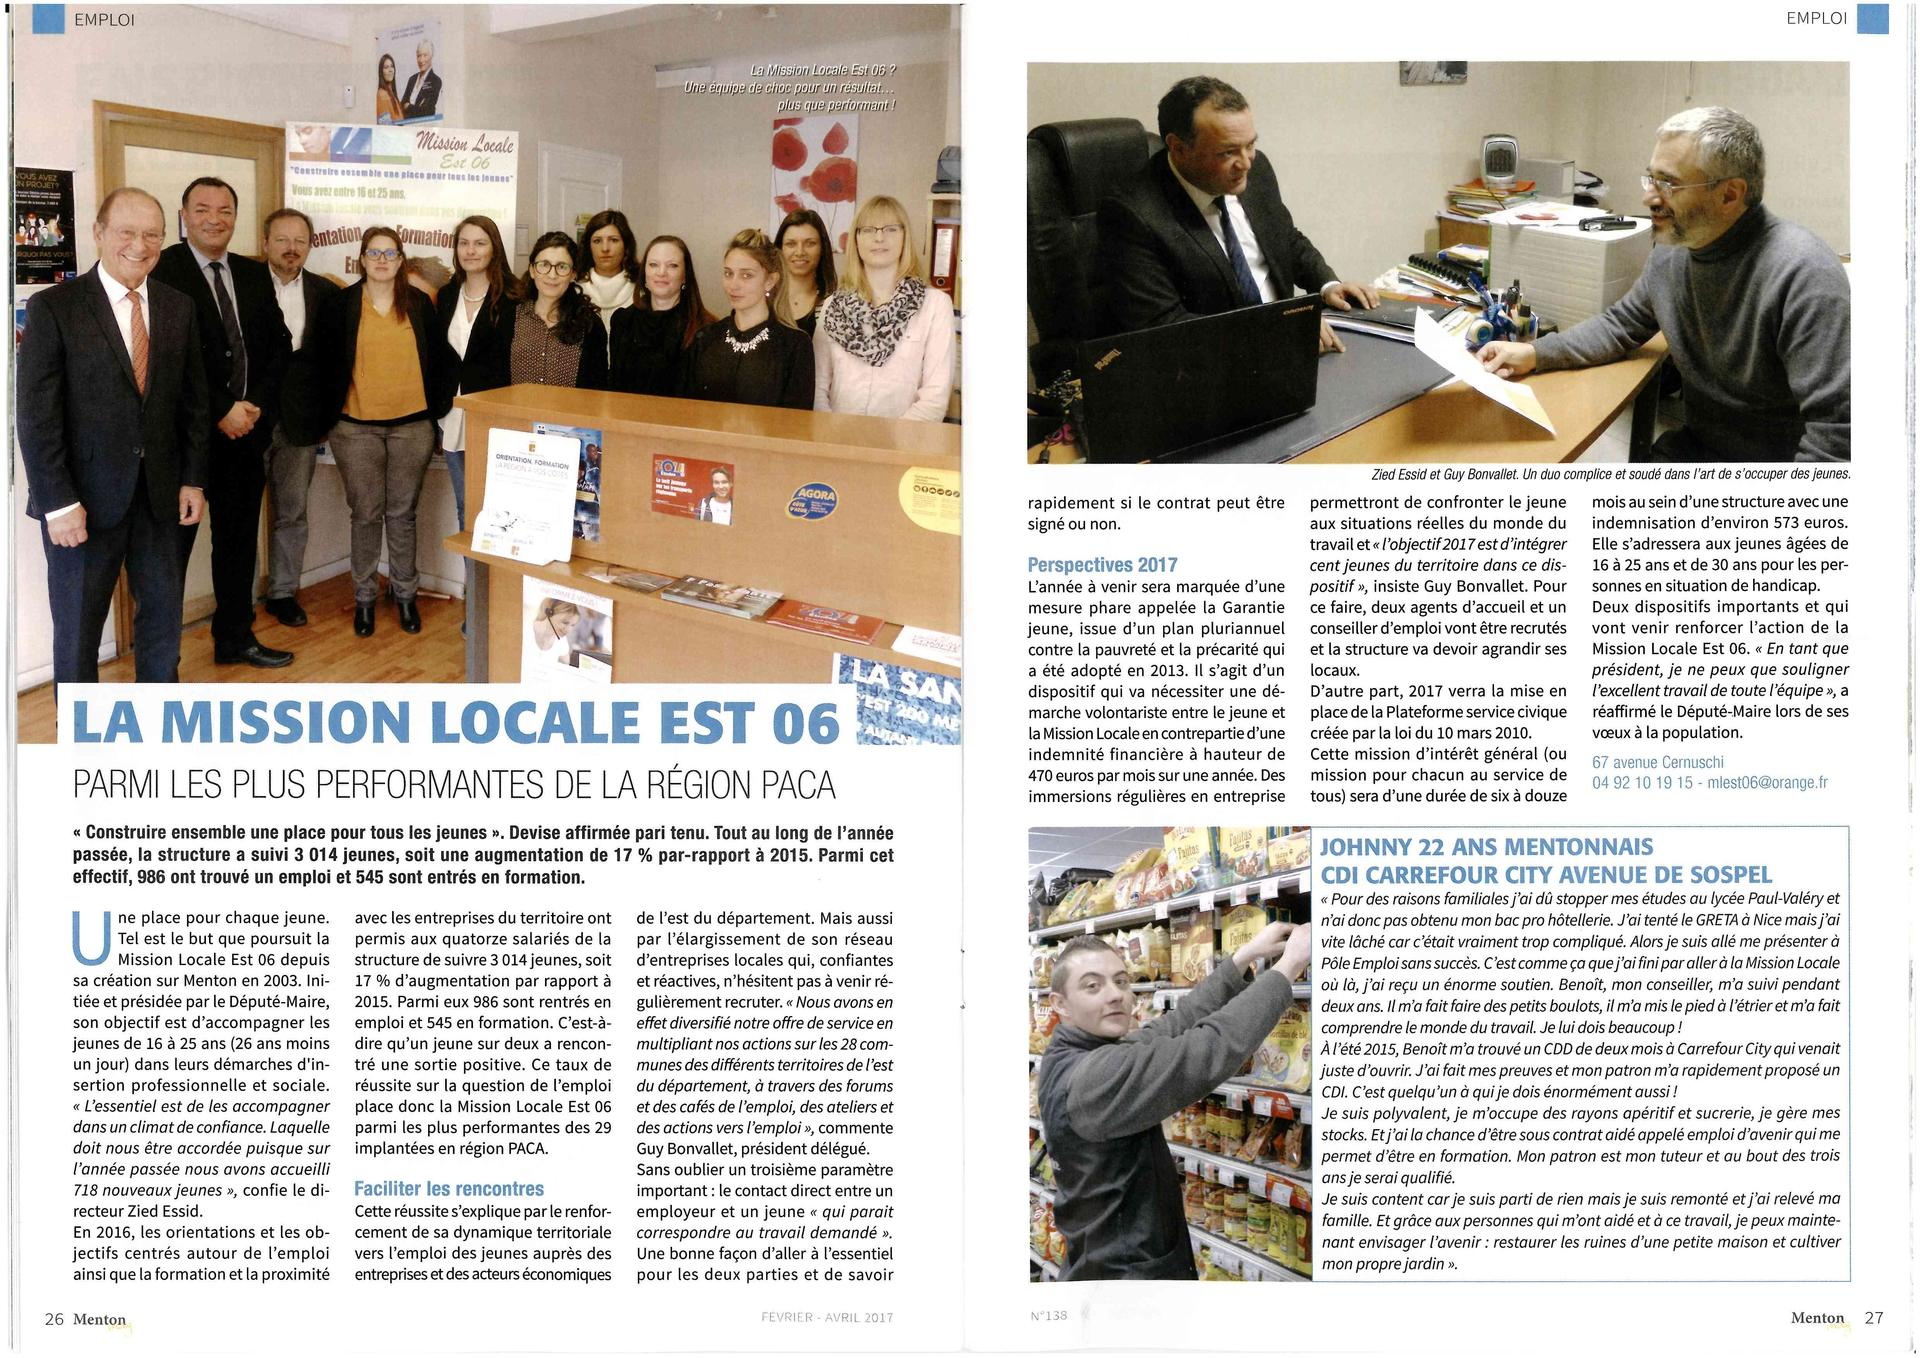 Menton Magazine